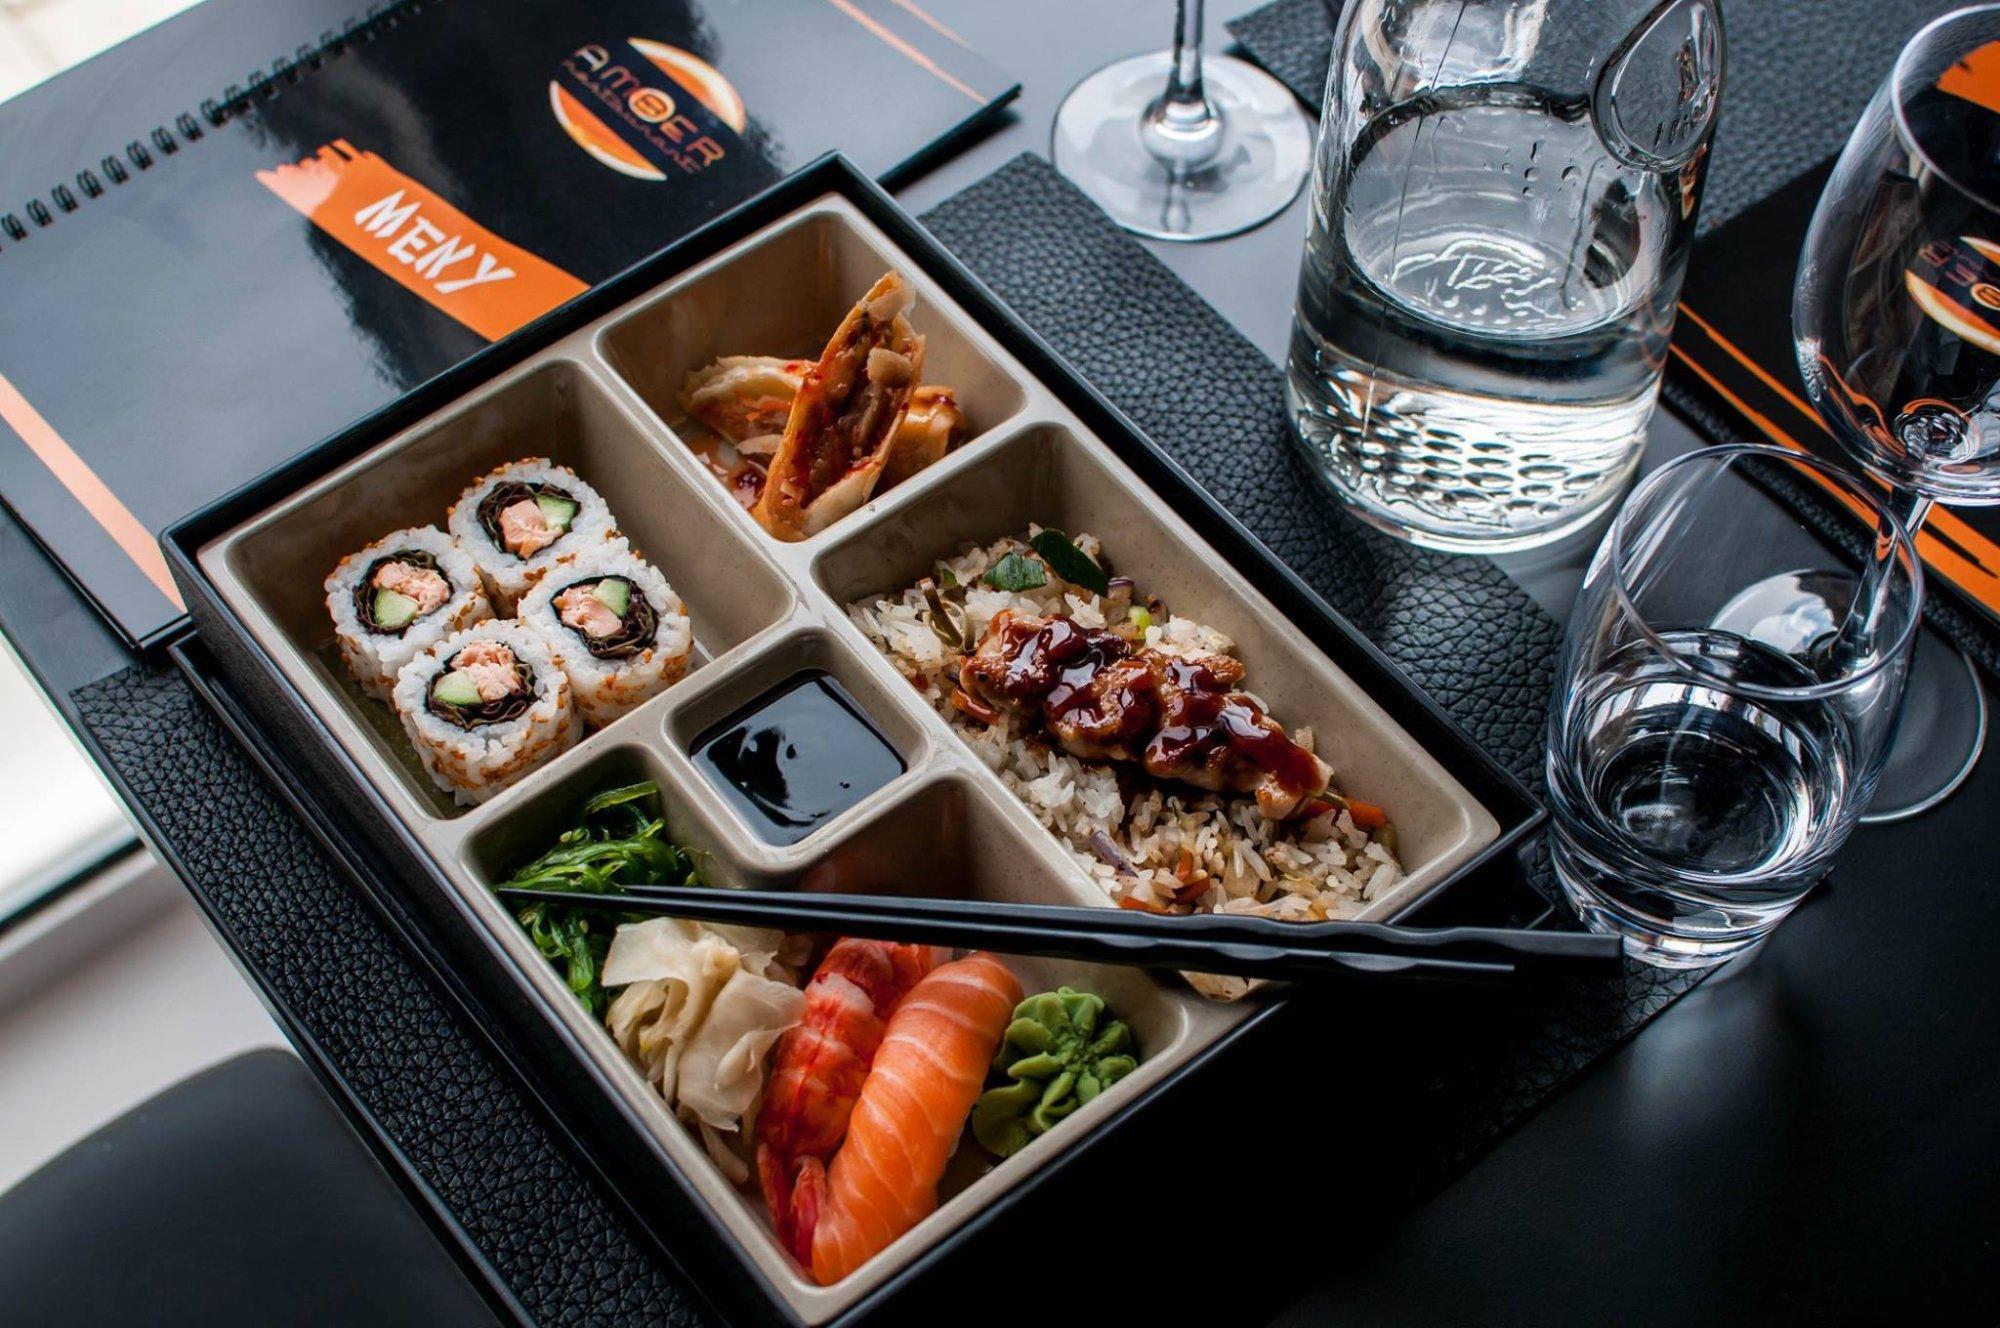 Amber asian food restaurant trondheim for Amber asian cuisine rathfarnham